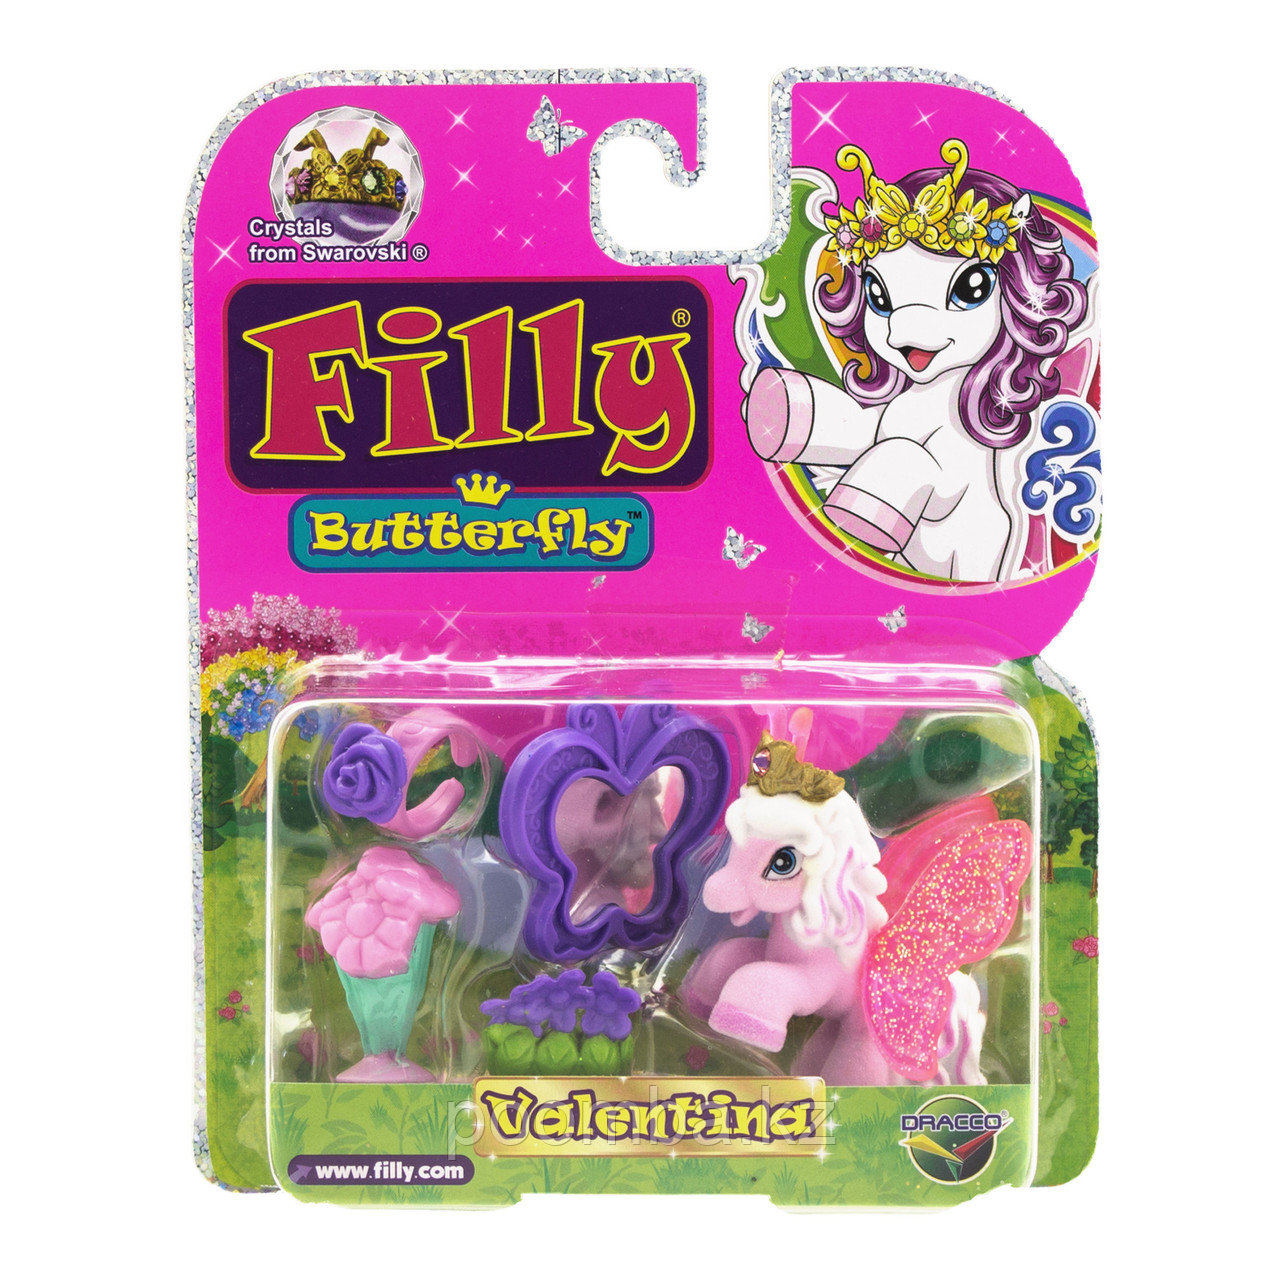 "Игровой набор Filly""Butterfly Glitter""с аксессуарами - Valentina"